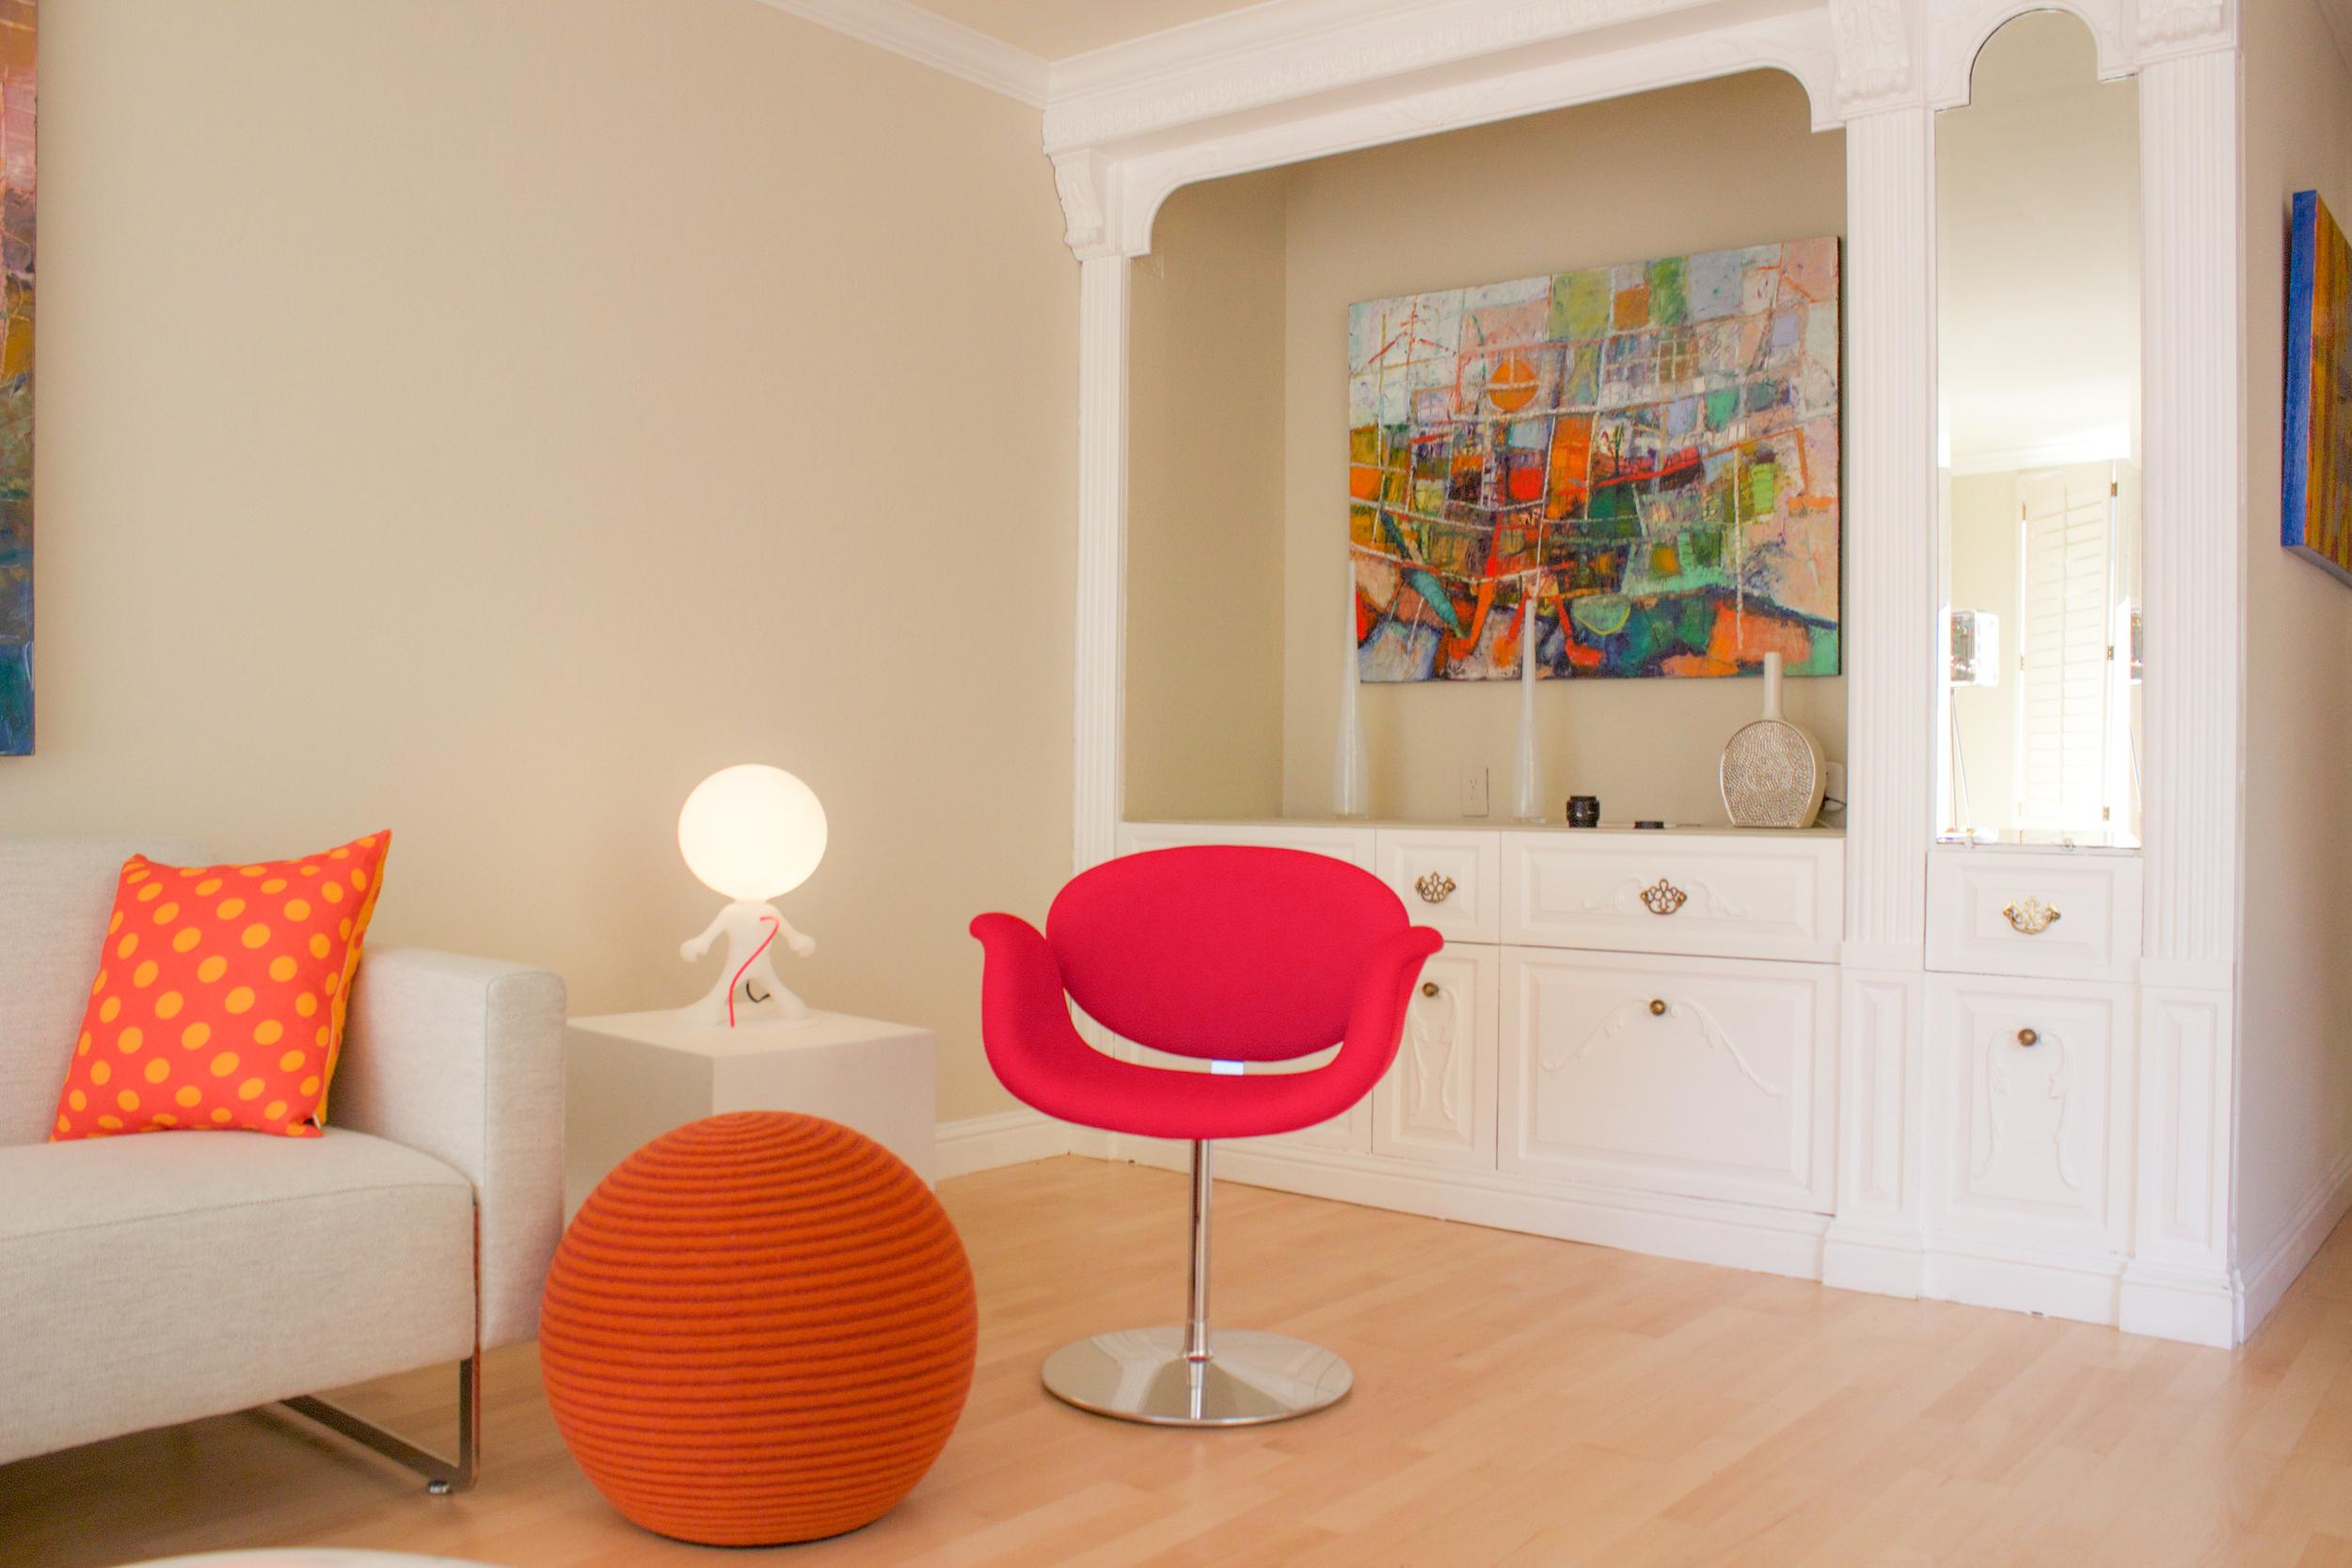 Featuring Montis orange Beanie, Artifort Little Tulip Chair, Dark table light and Mare Sofa.